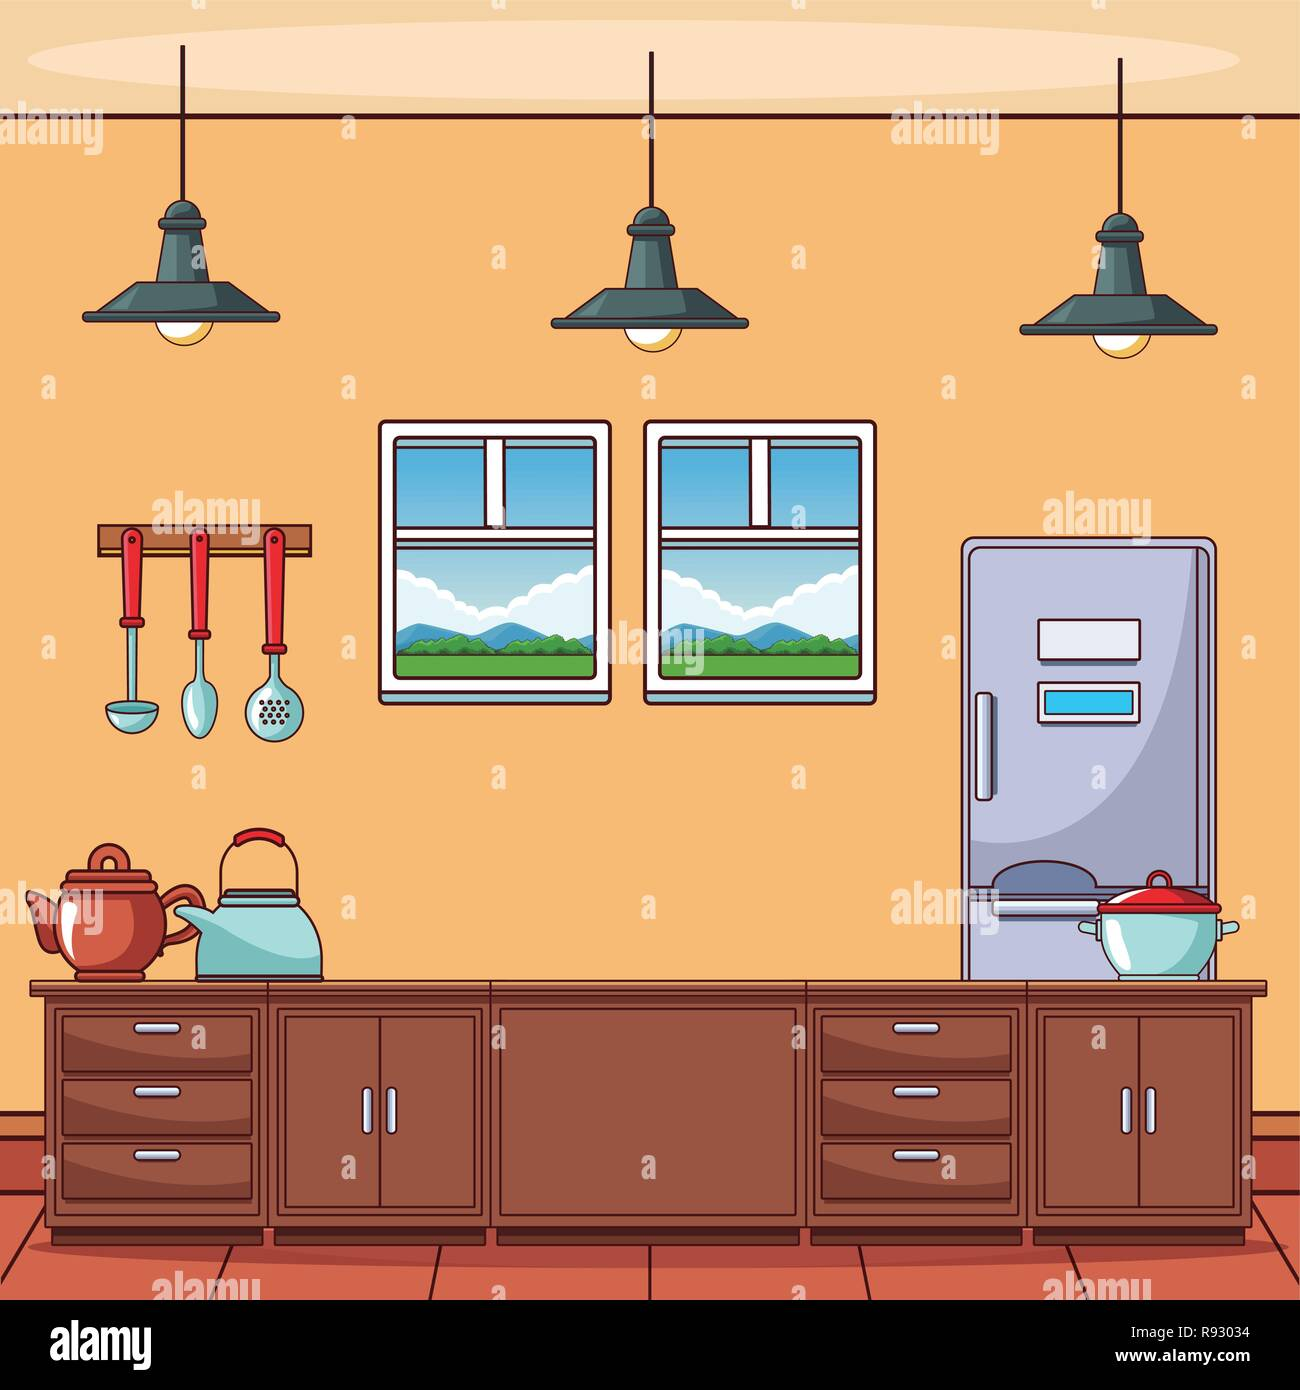 Kitchen with utensils - Stock Vector